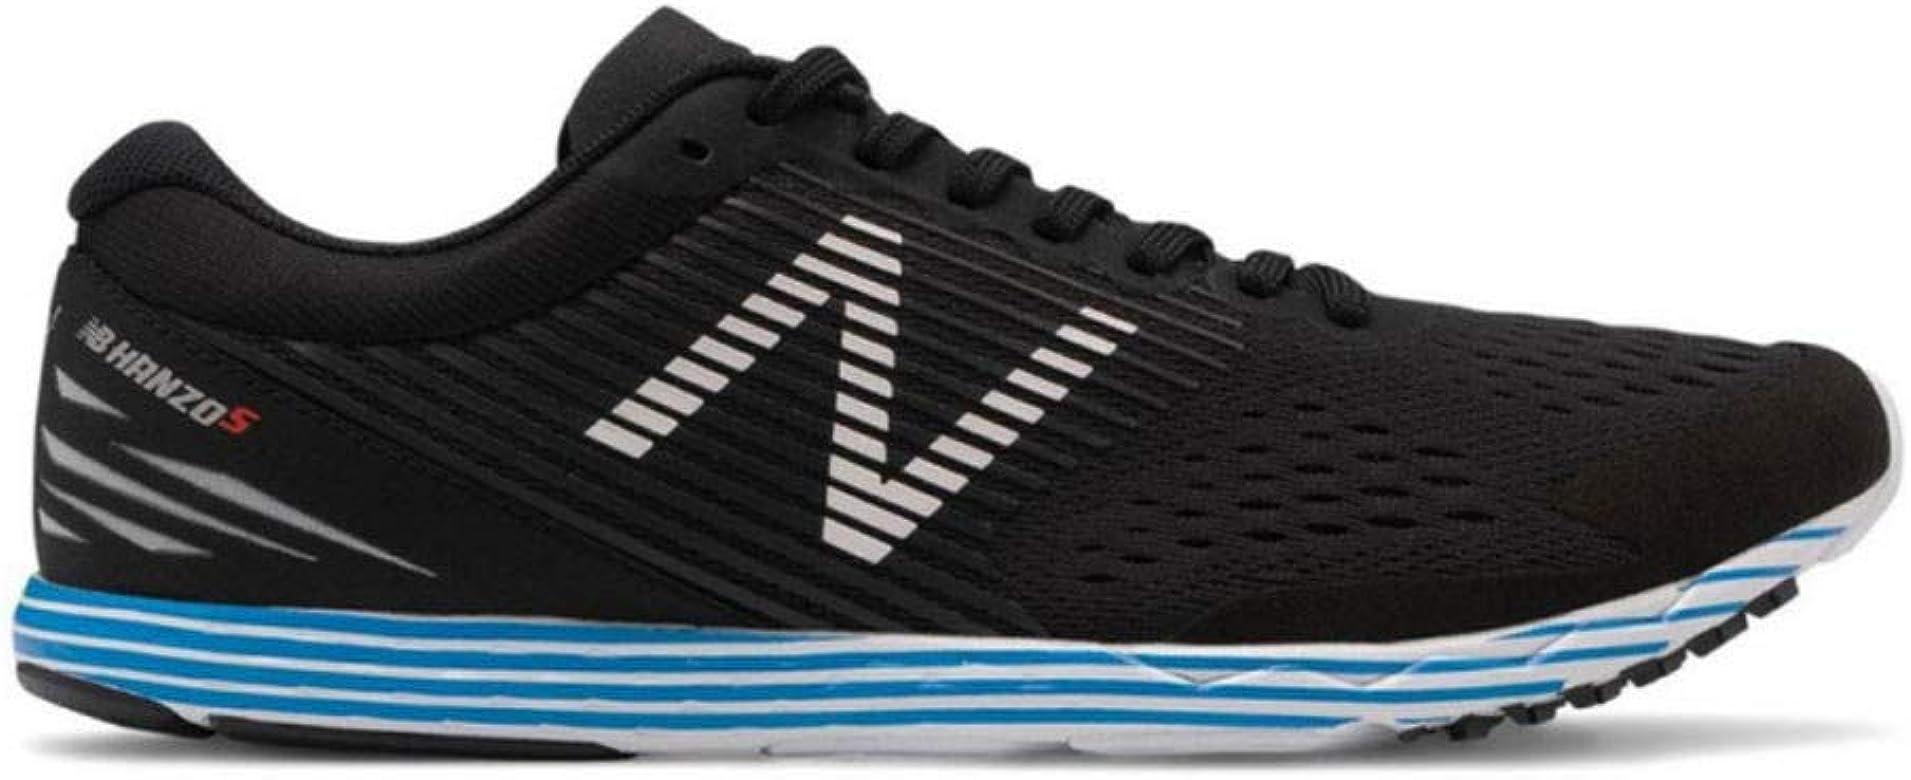 MHANZSGF Trail Running Shoe, Multicolor